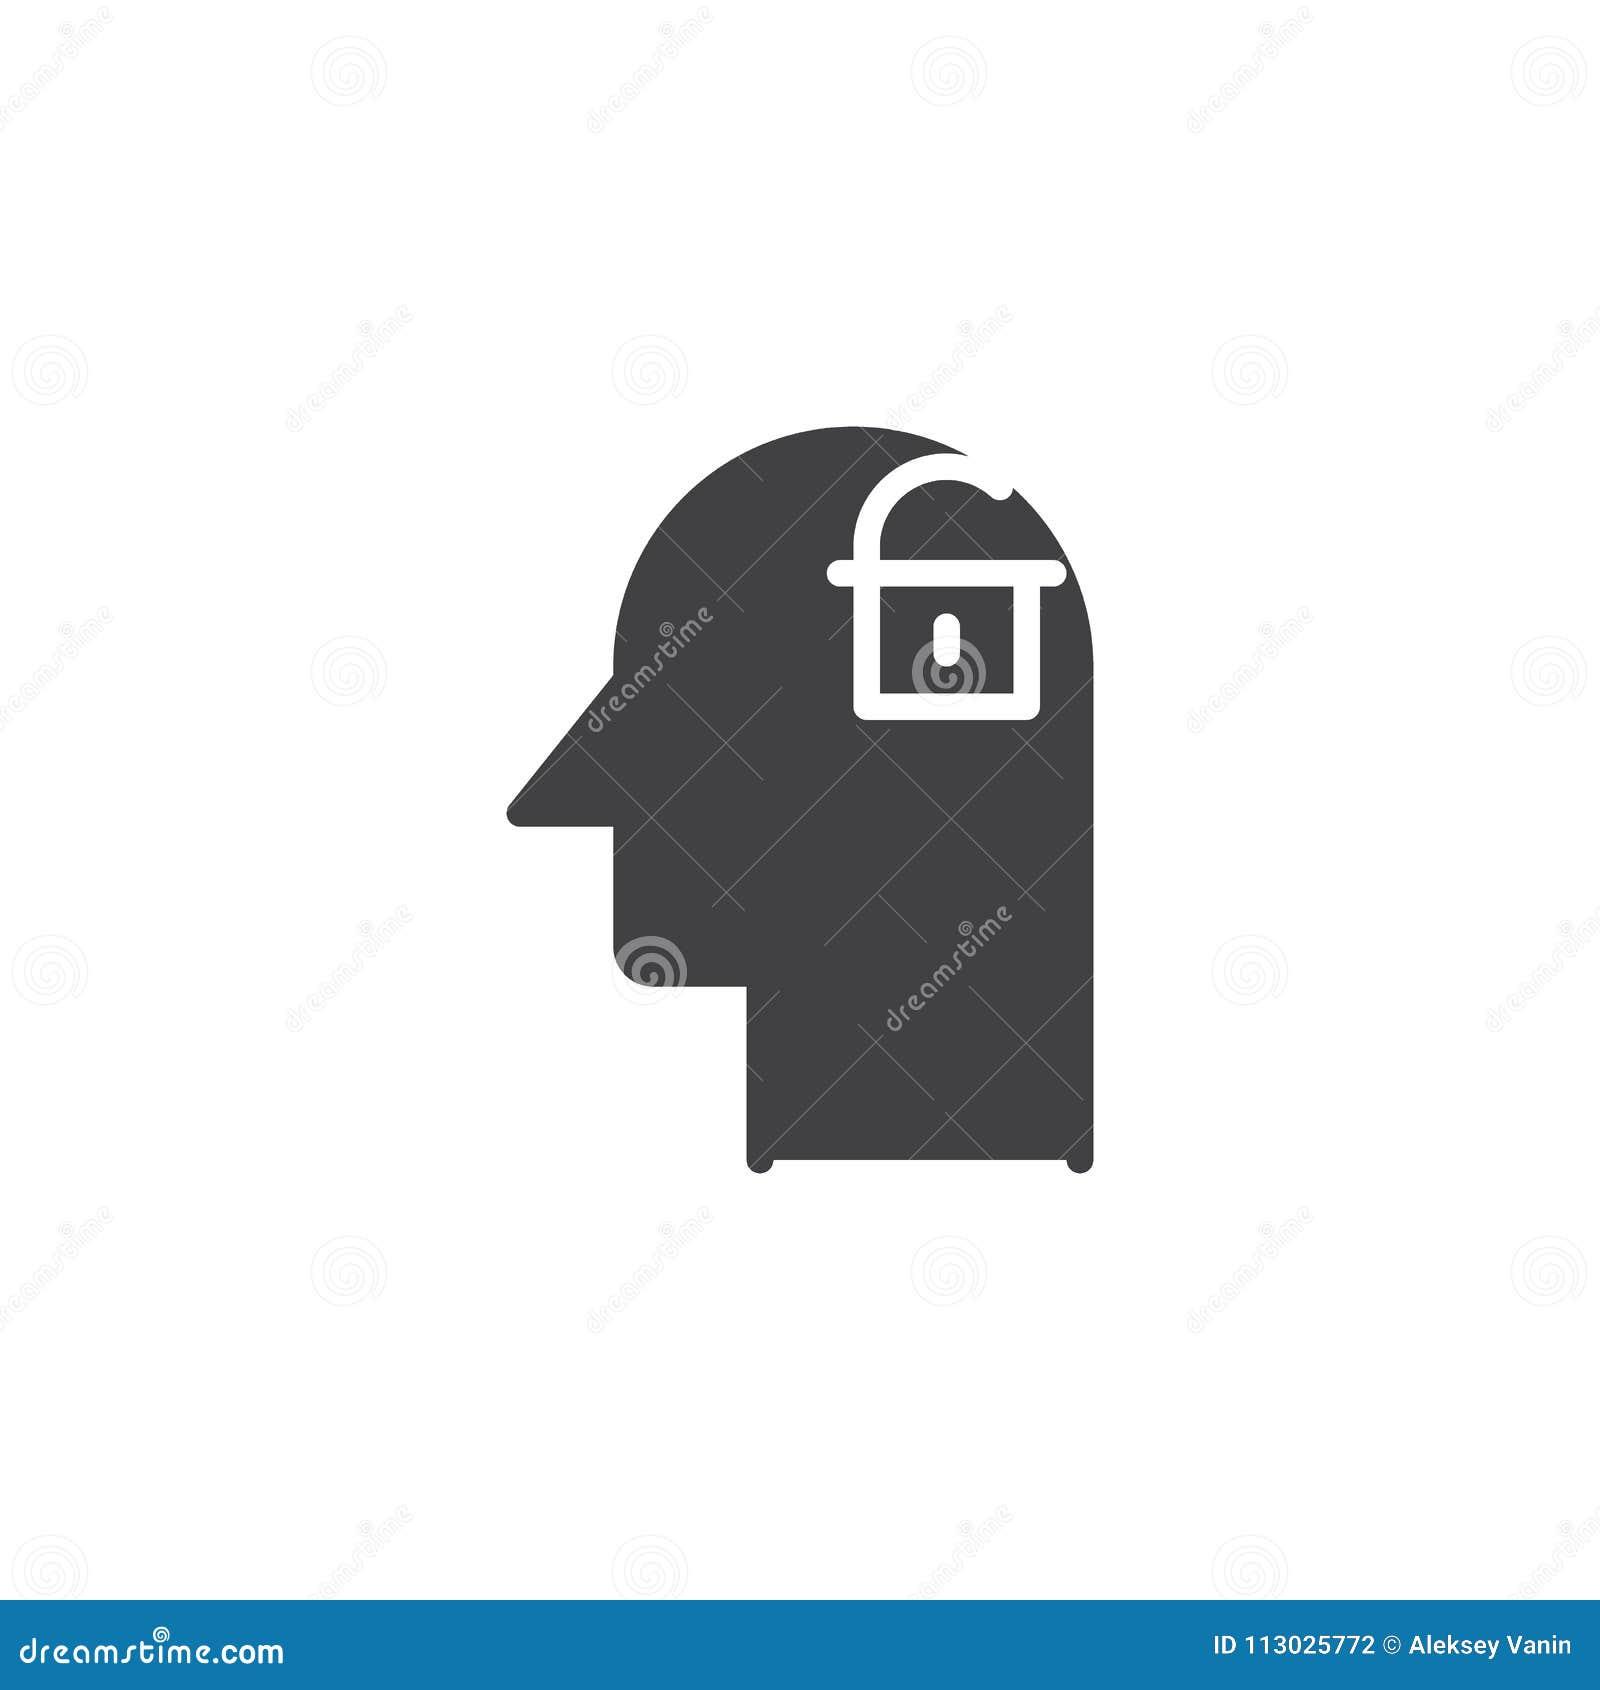 Cabeza humana con la cerradura abierta dentro del icono del vector